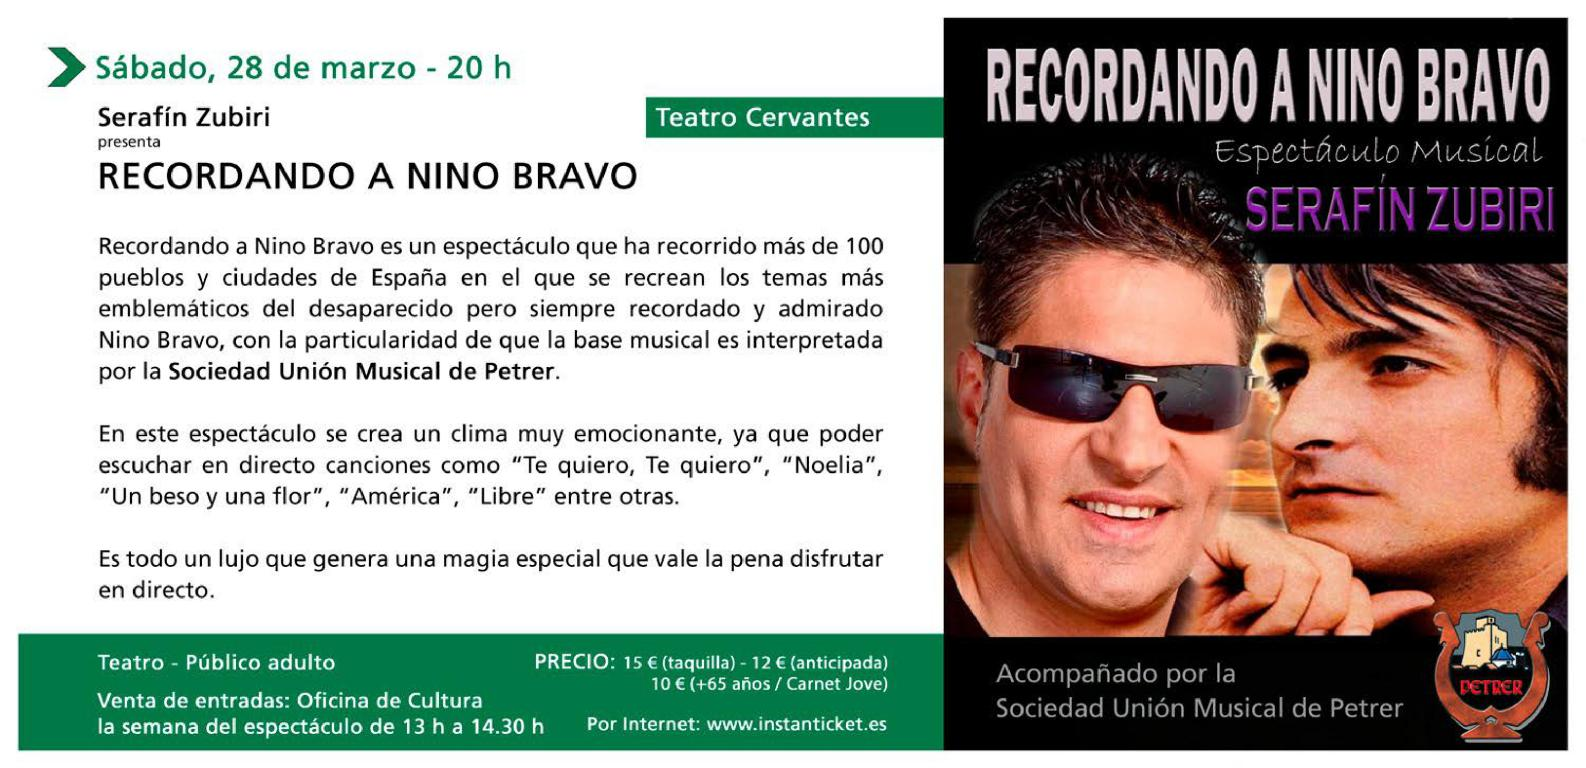 Programacin-Teatro-Cervantes-2020_page-0008.jpg